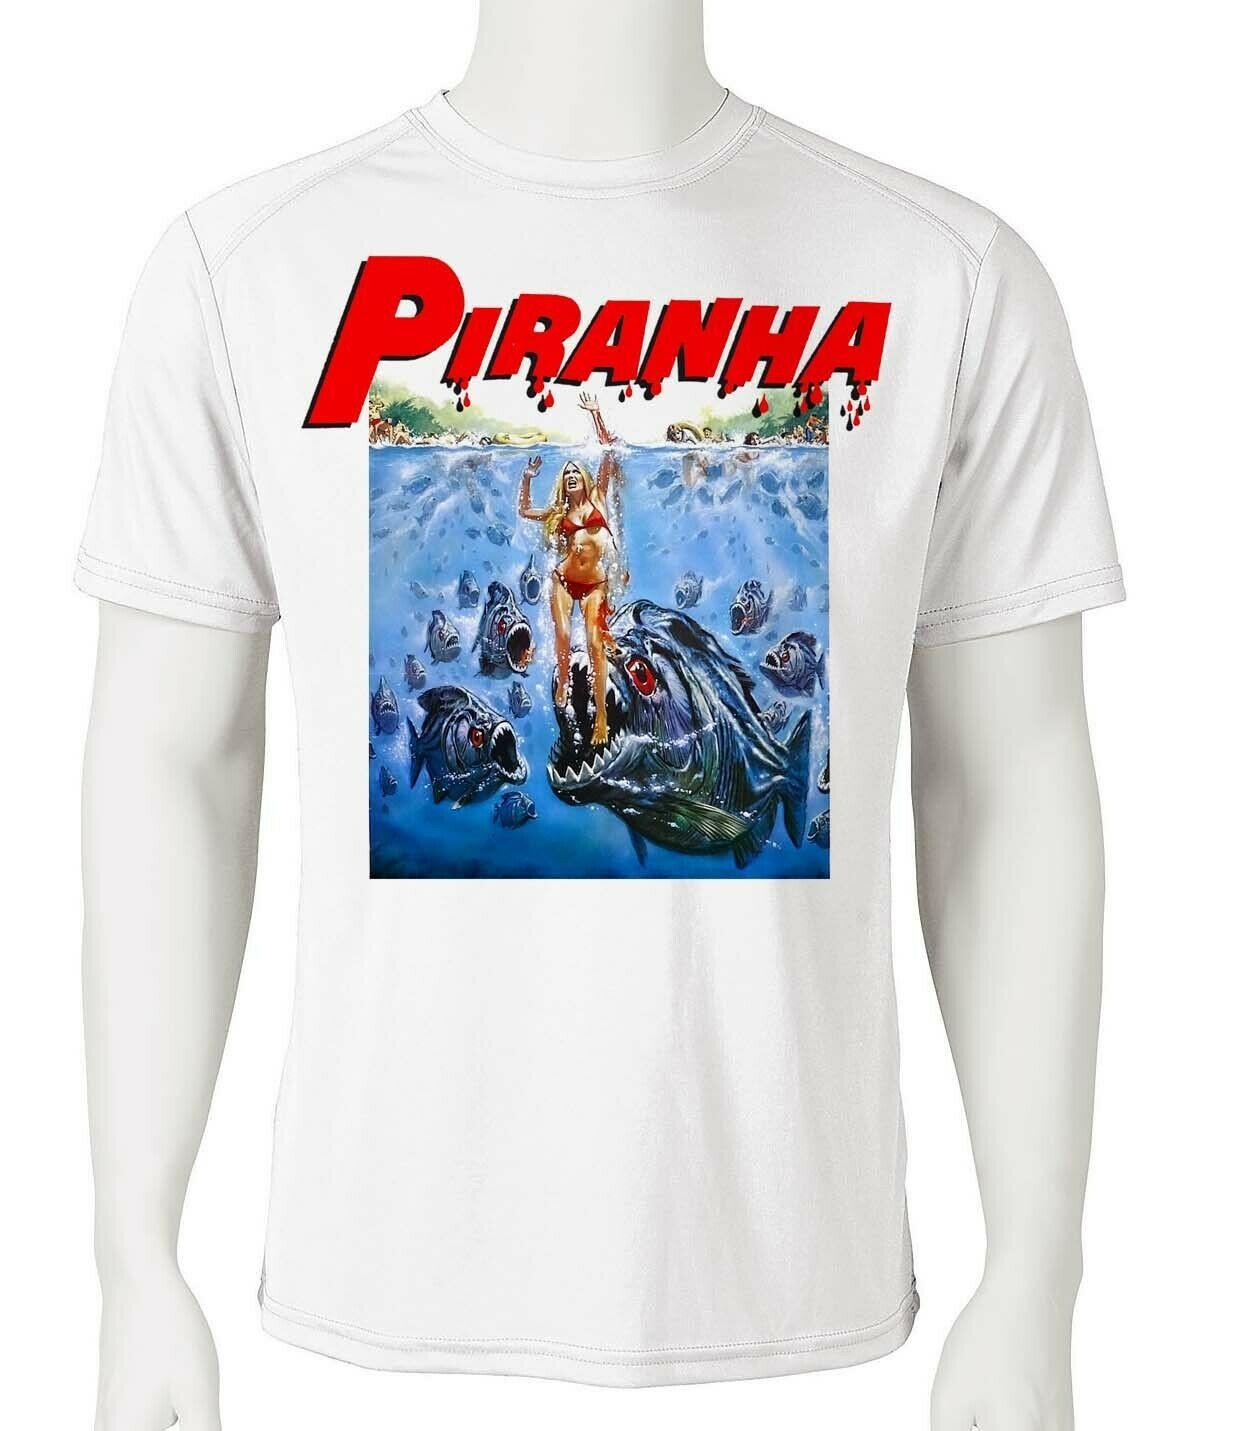 Piranha dri fit for sale online graphic tee 80 s retro sci fi horror tshirt